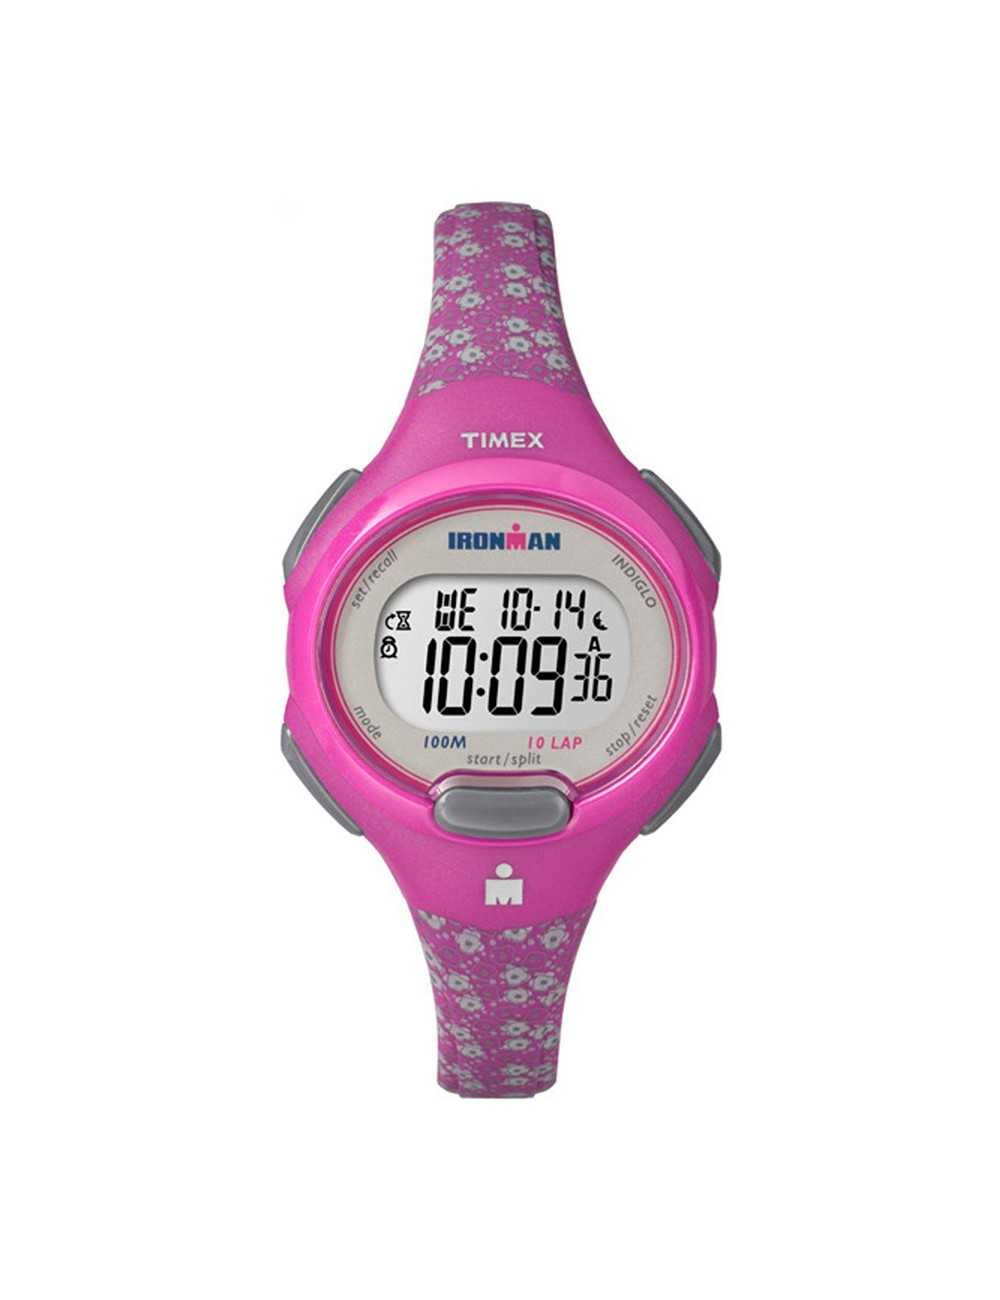 Dámske hodinky Chronograph Timex Ironman Essential 10 TW5M07000